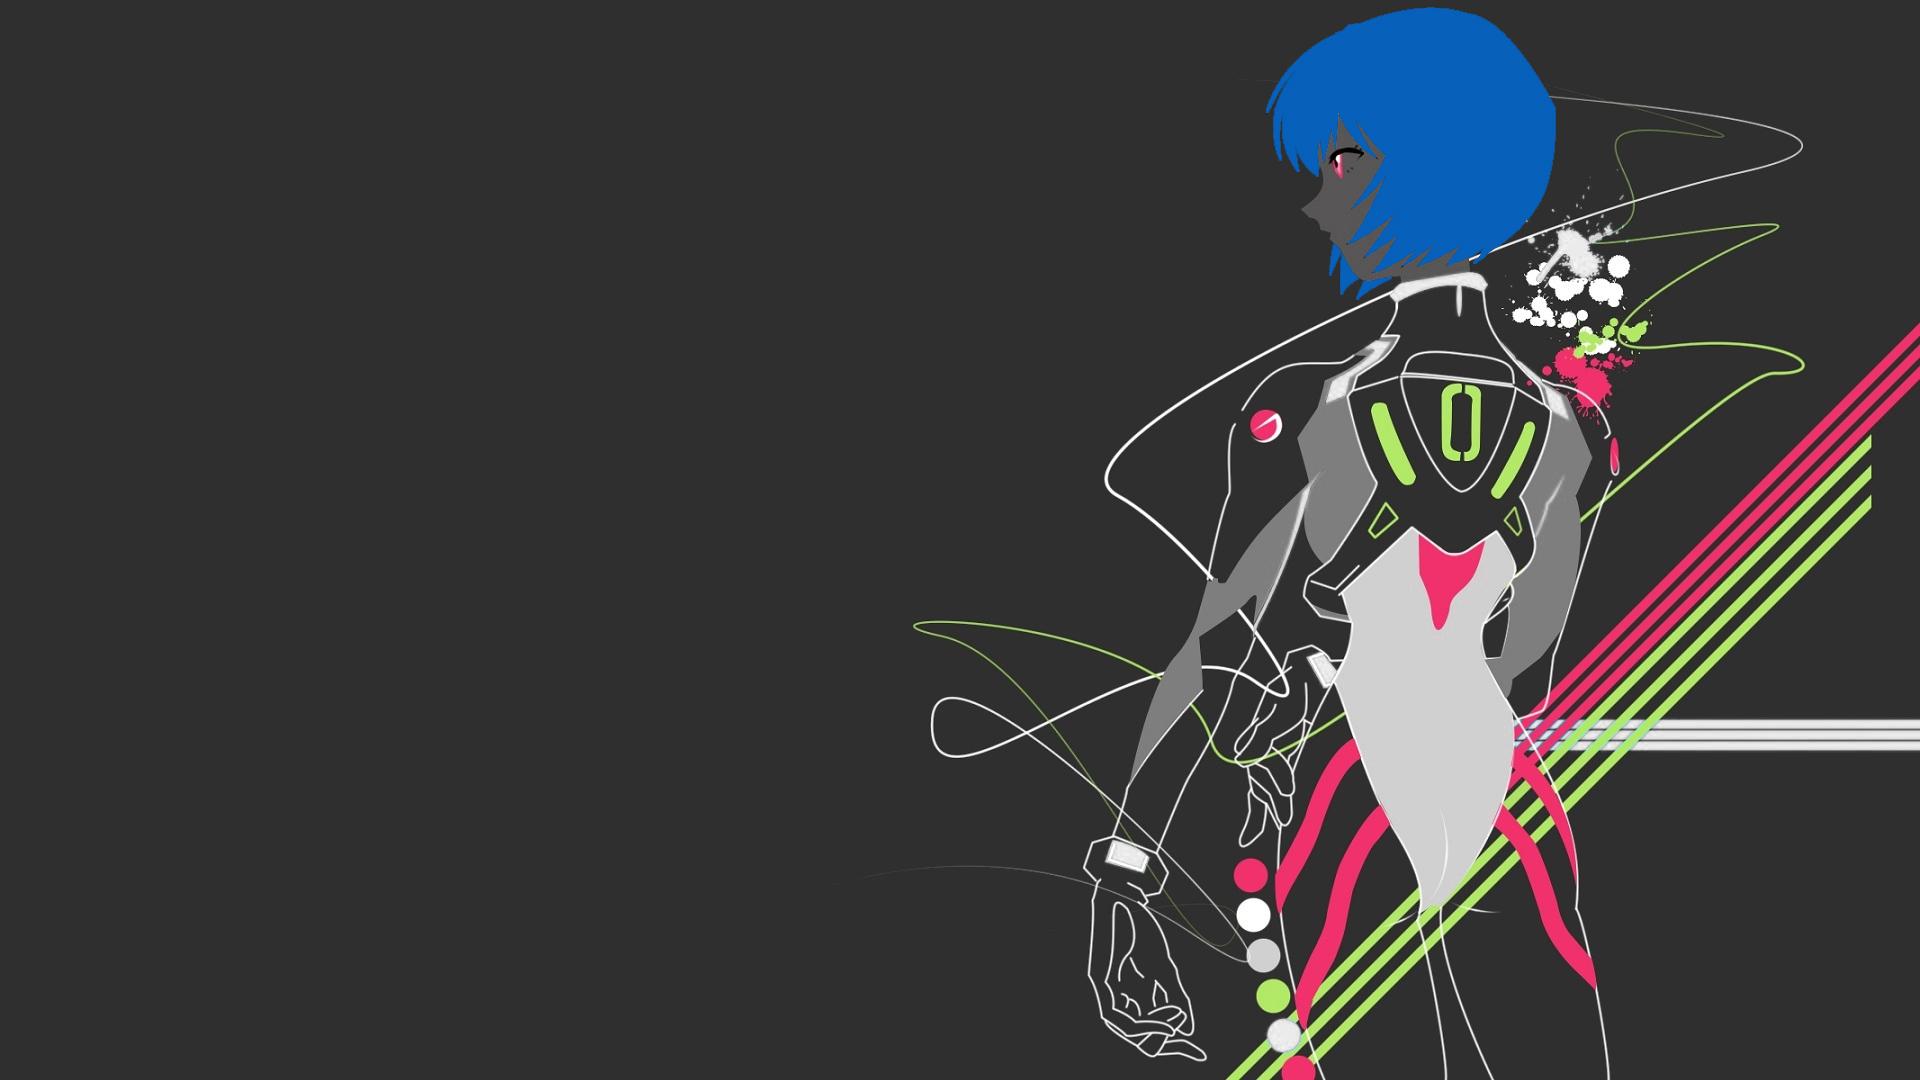 Neon Genesis Evangelion Wallpaper HD - WallpaperSafari